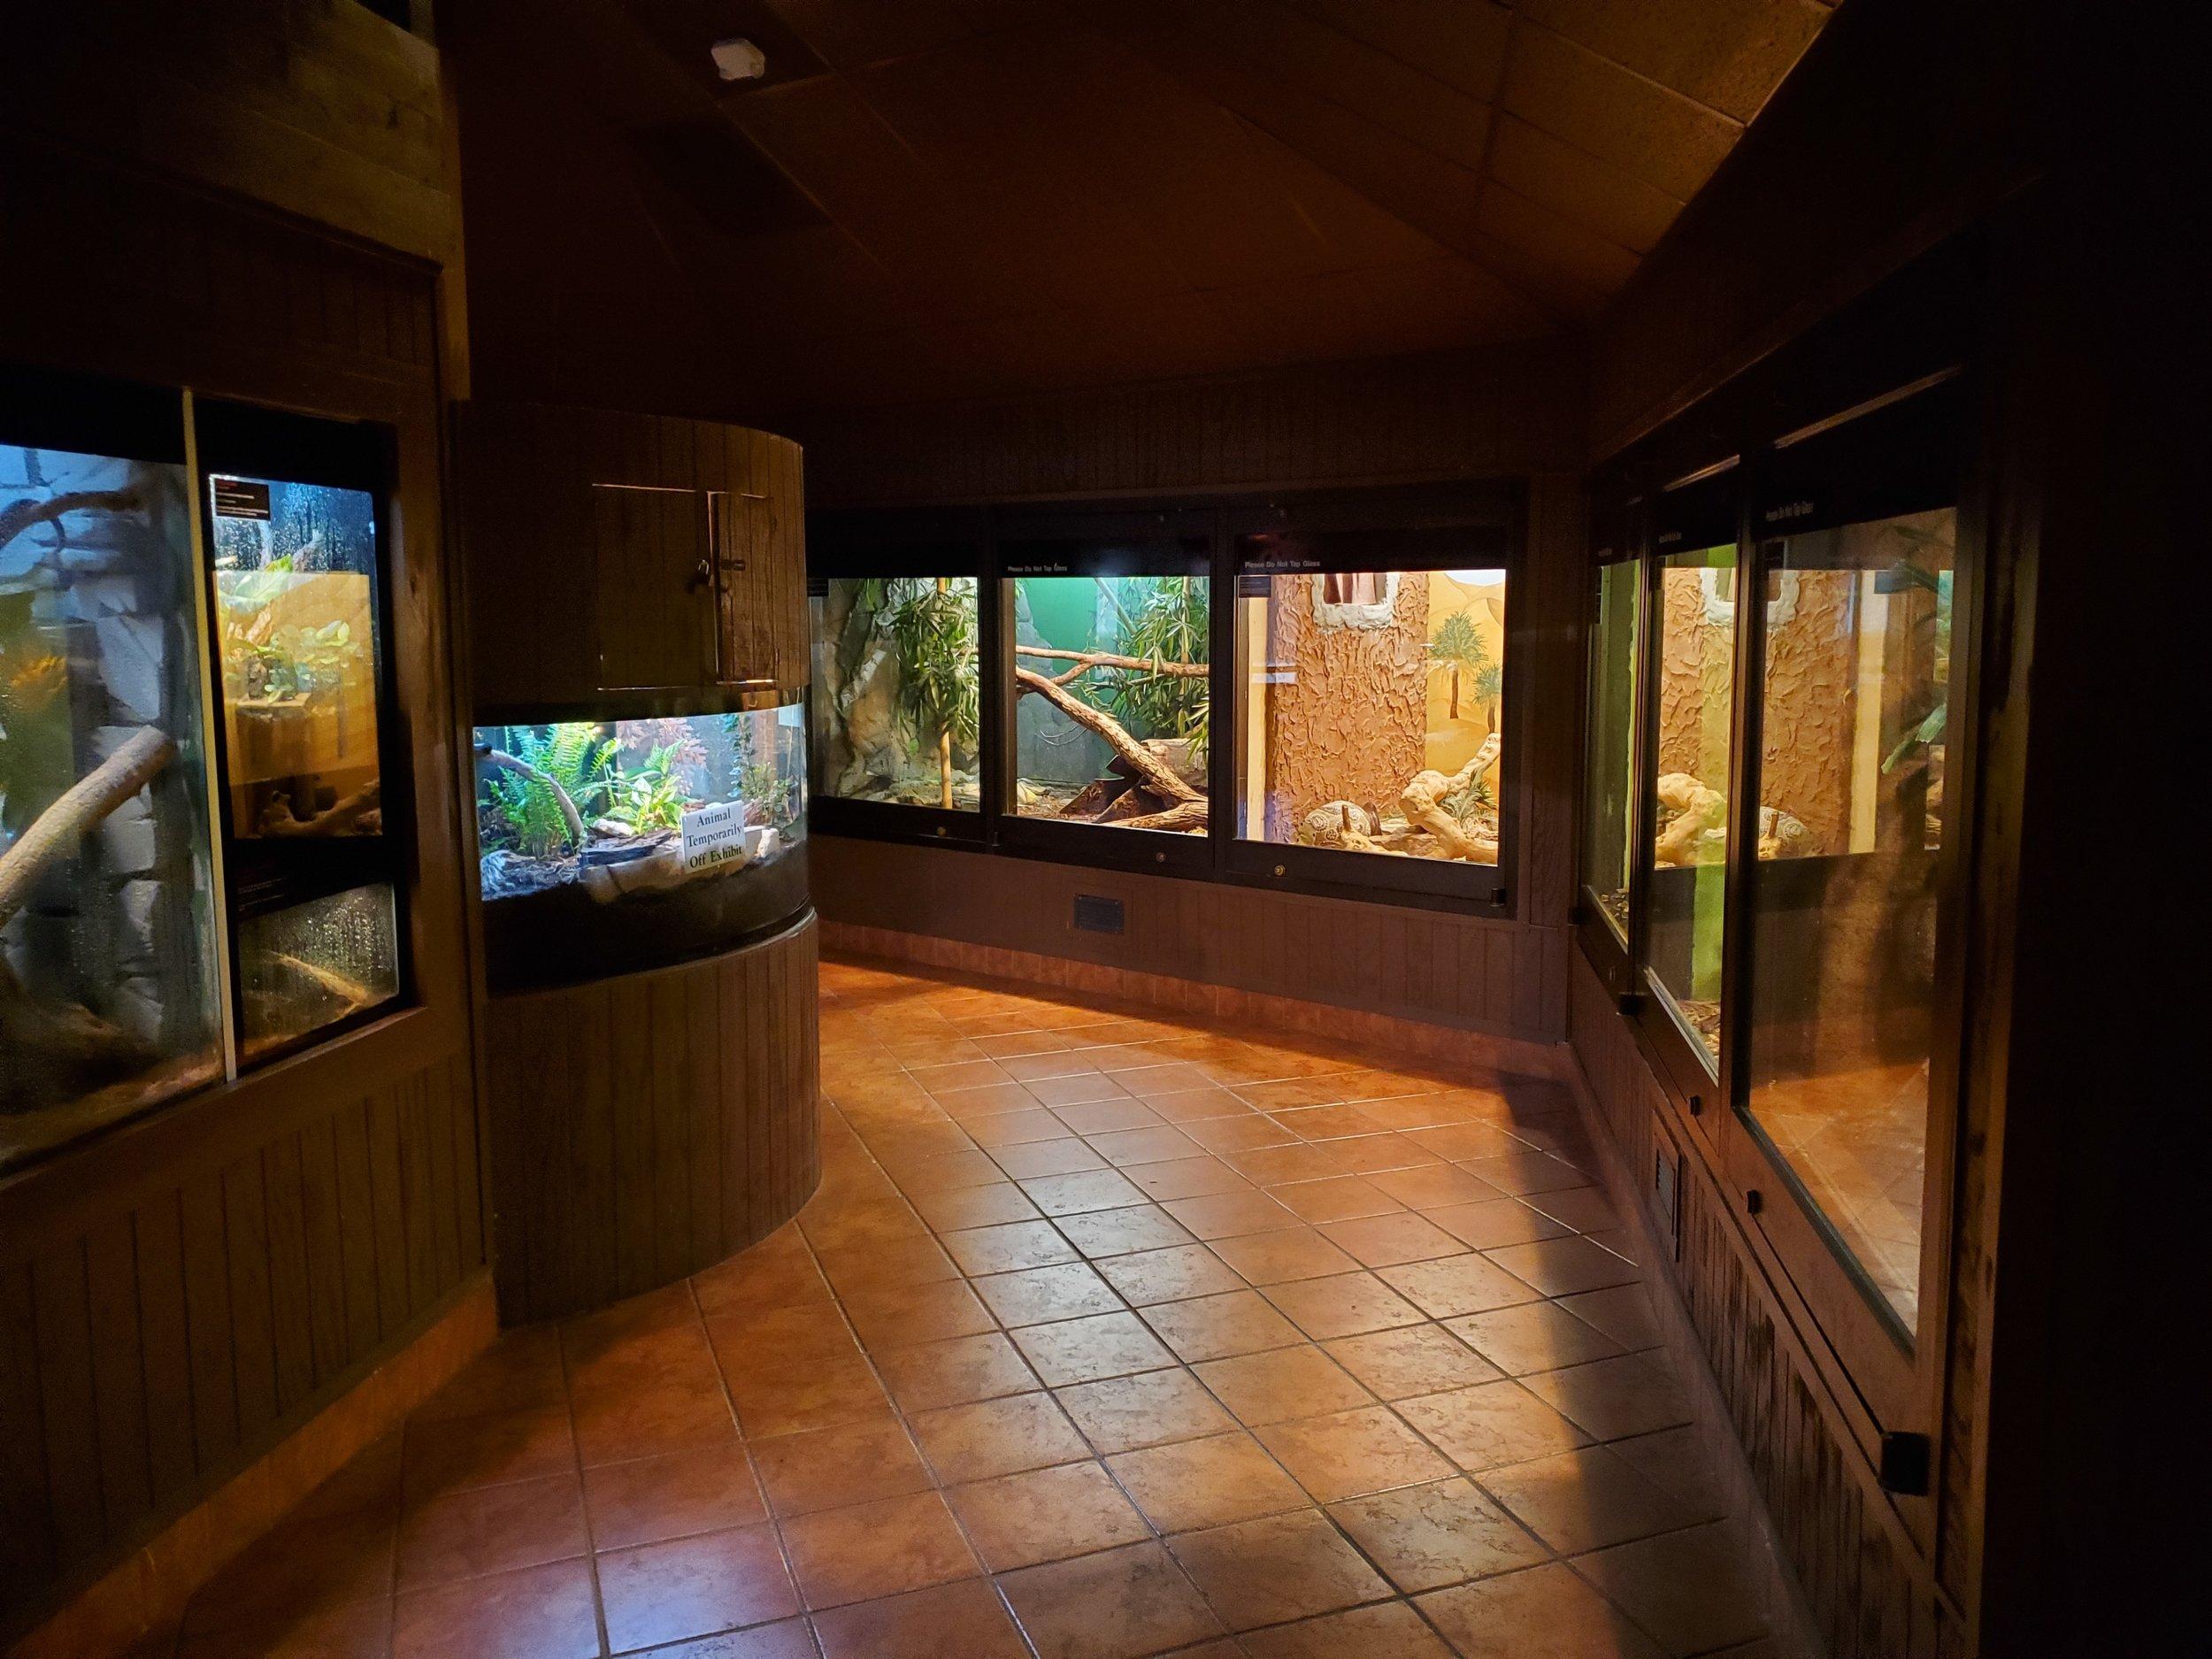 Older habitats